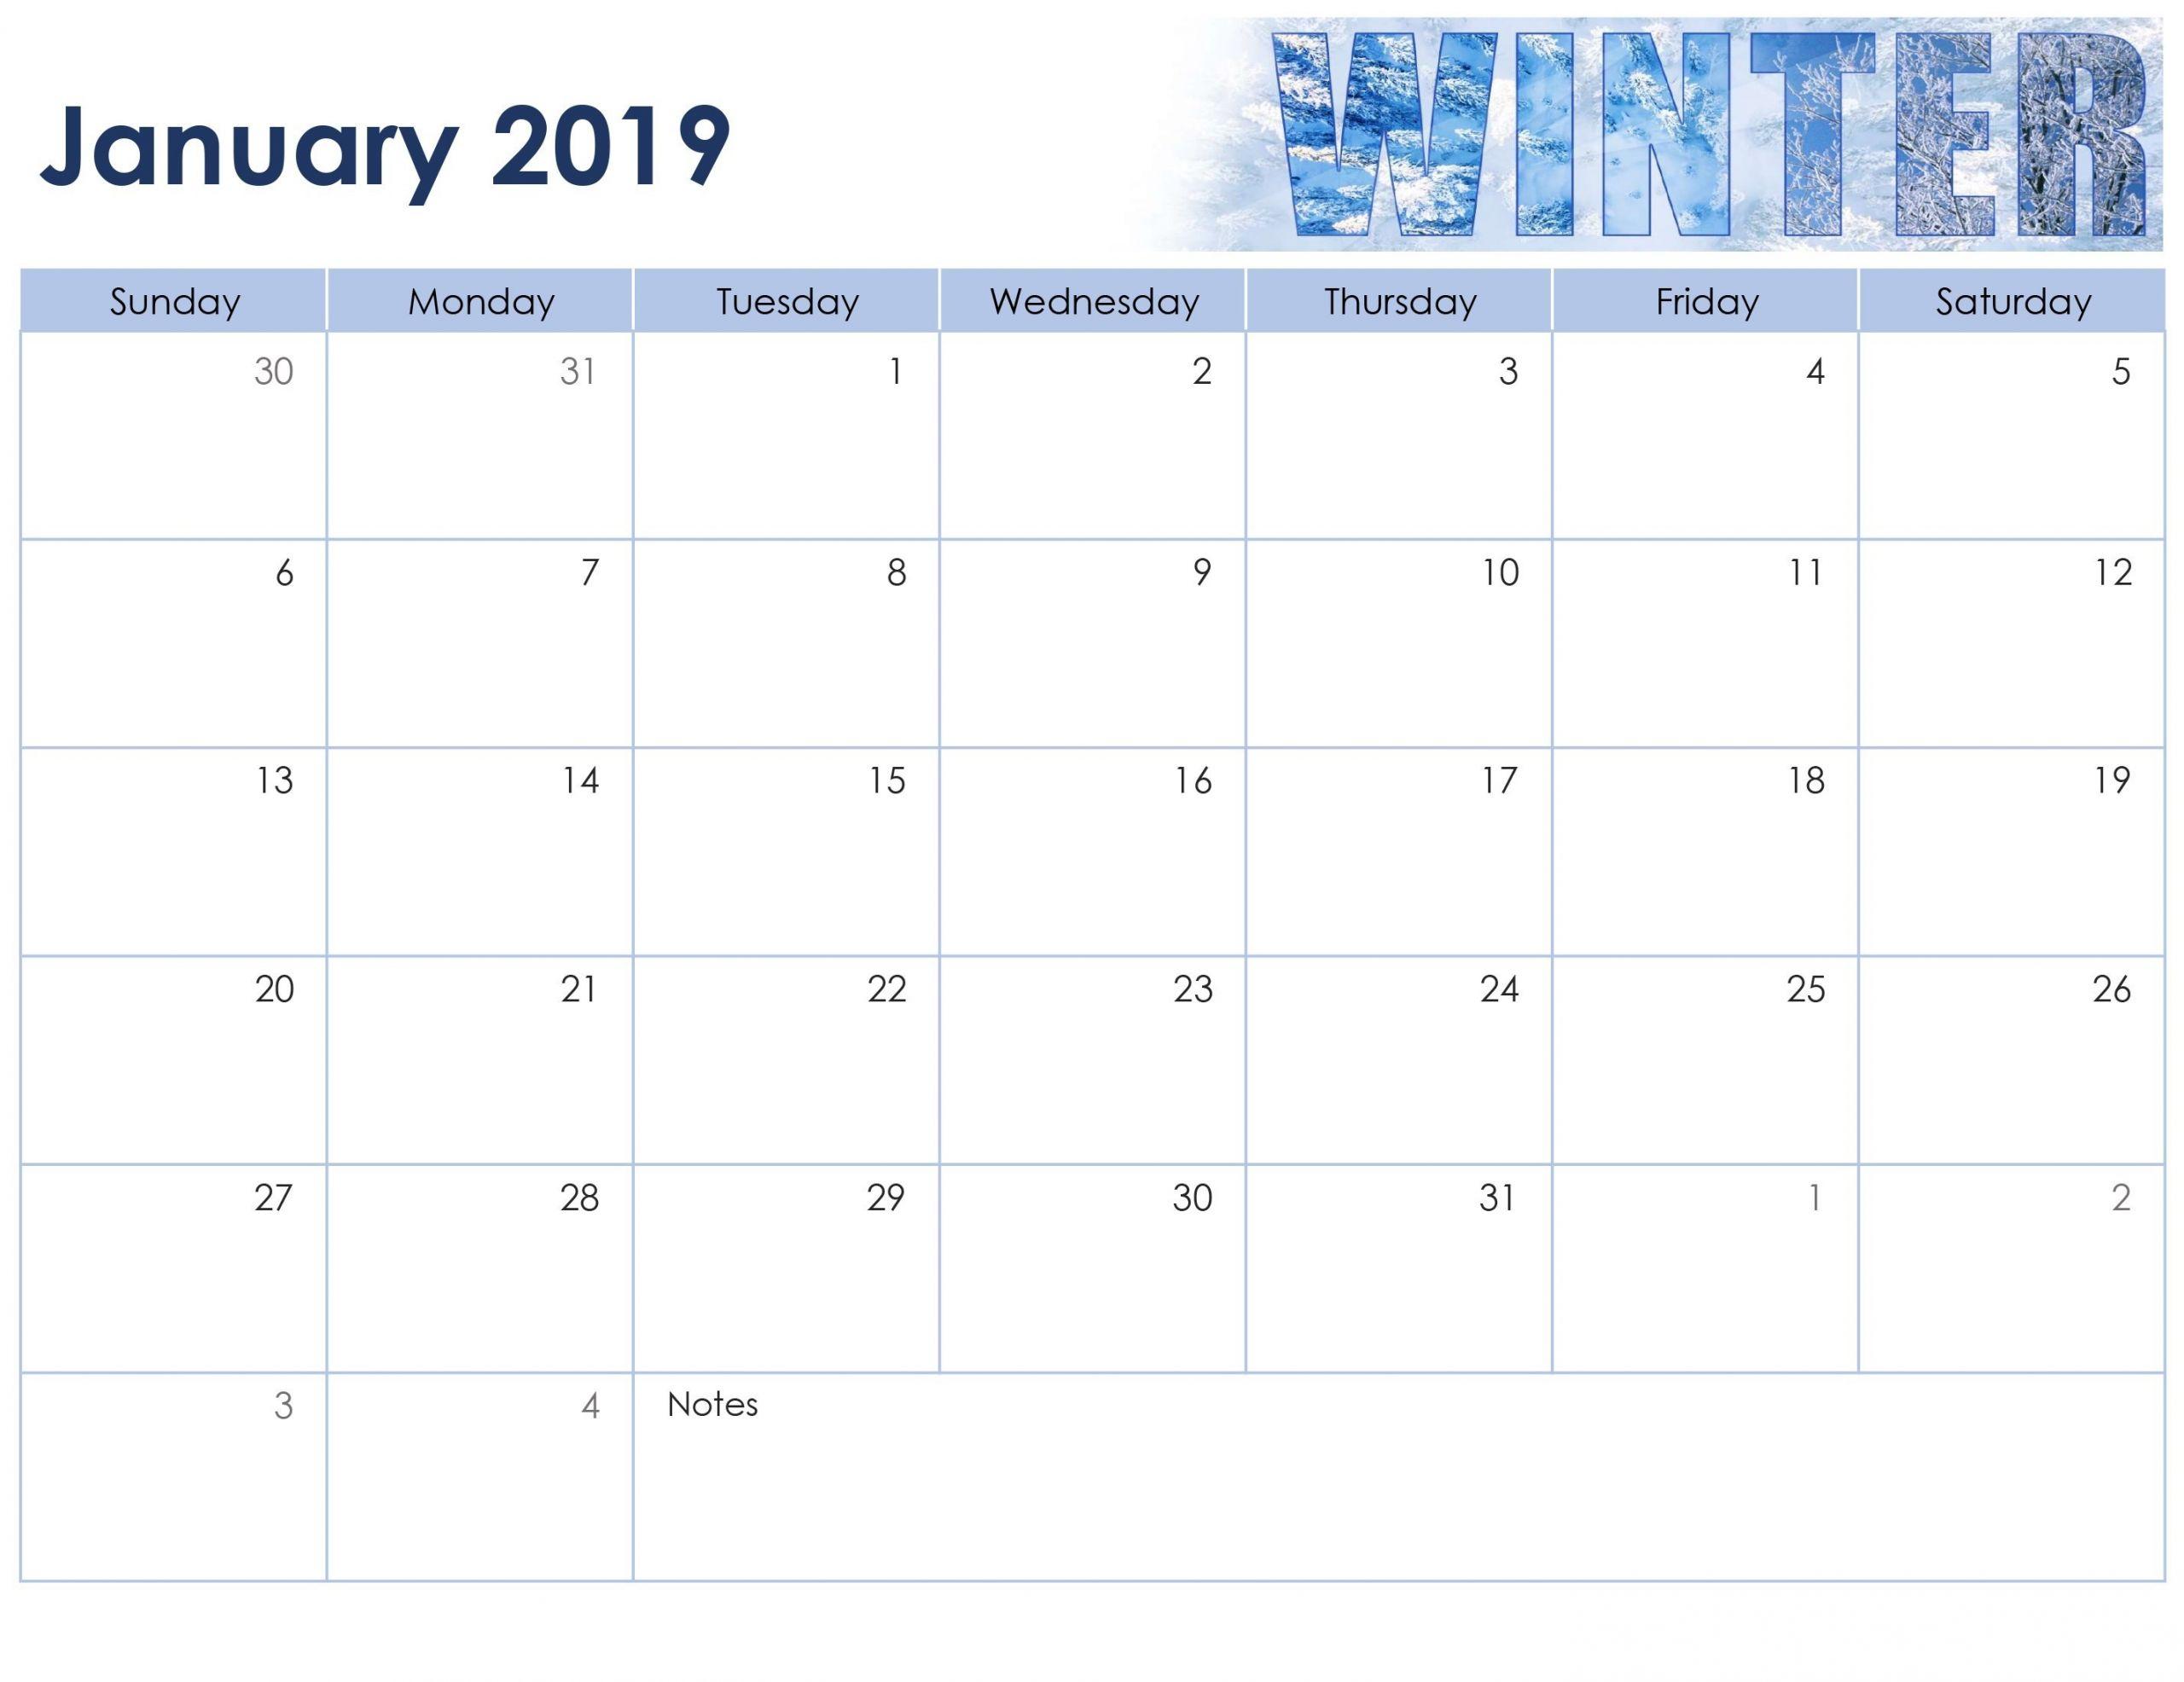 calendar 2018 y 2019 excel mas arriba a fecha template 9 2016 calendar for excel year at a glance 1 page in word of calendar 2018 y 2019 excel